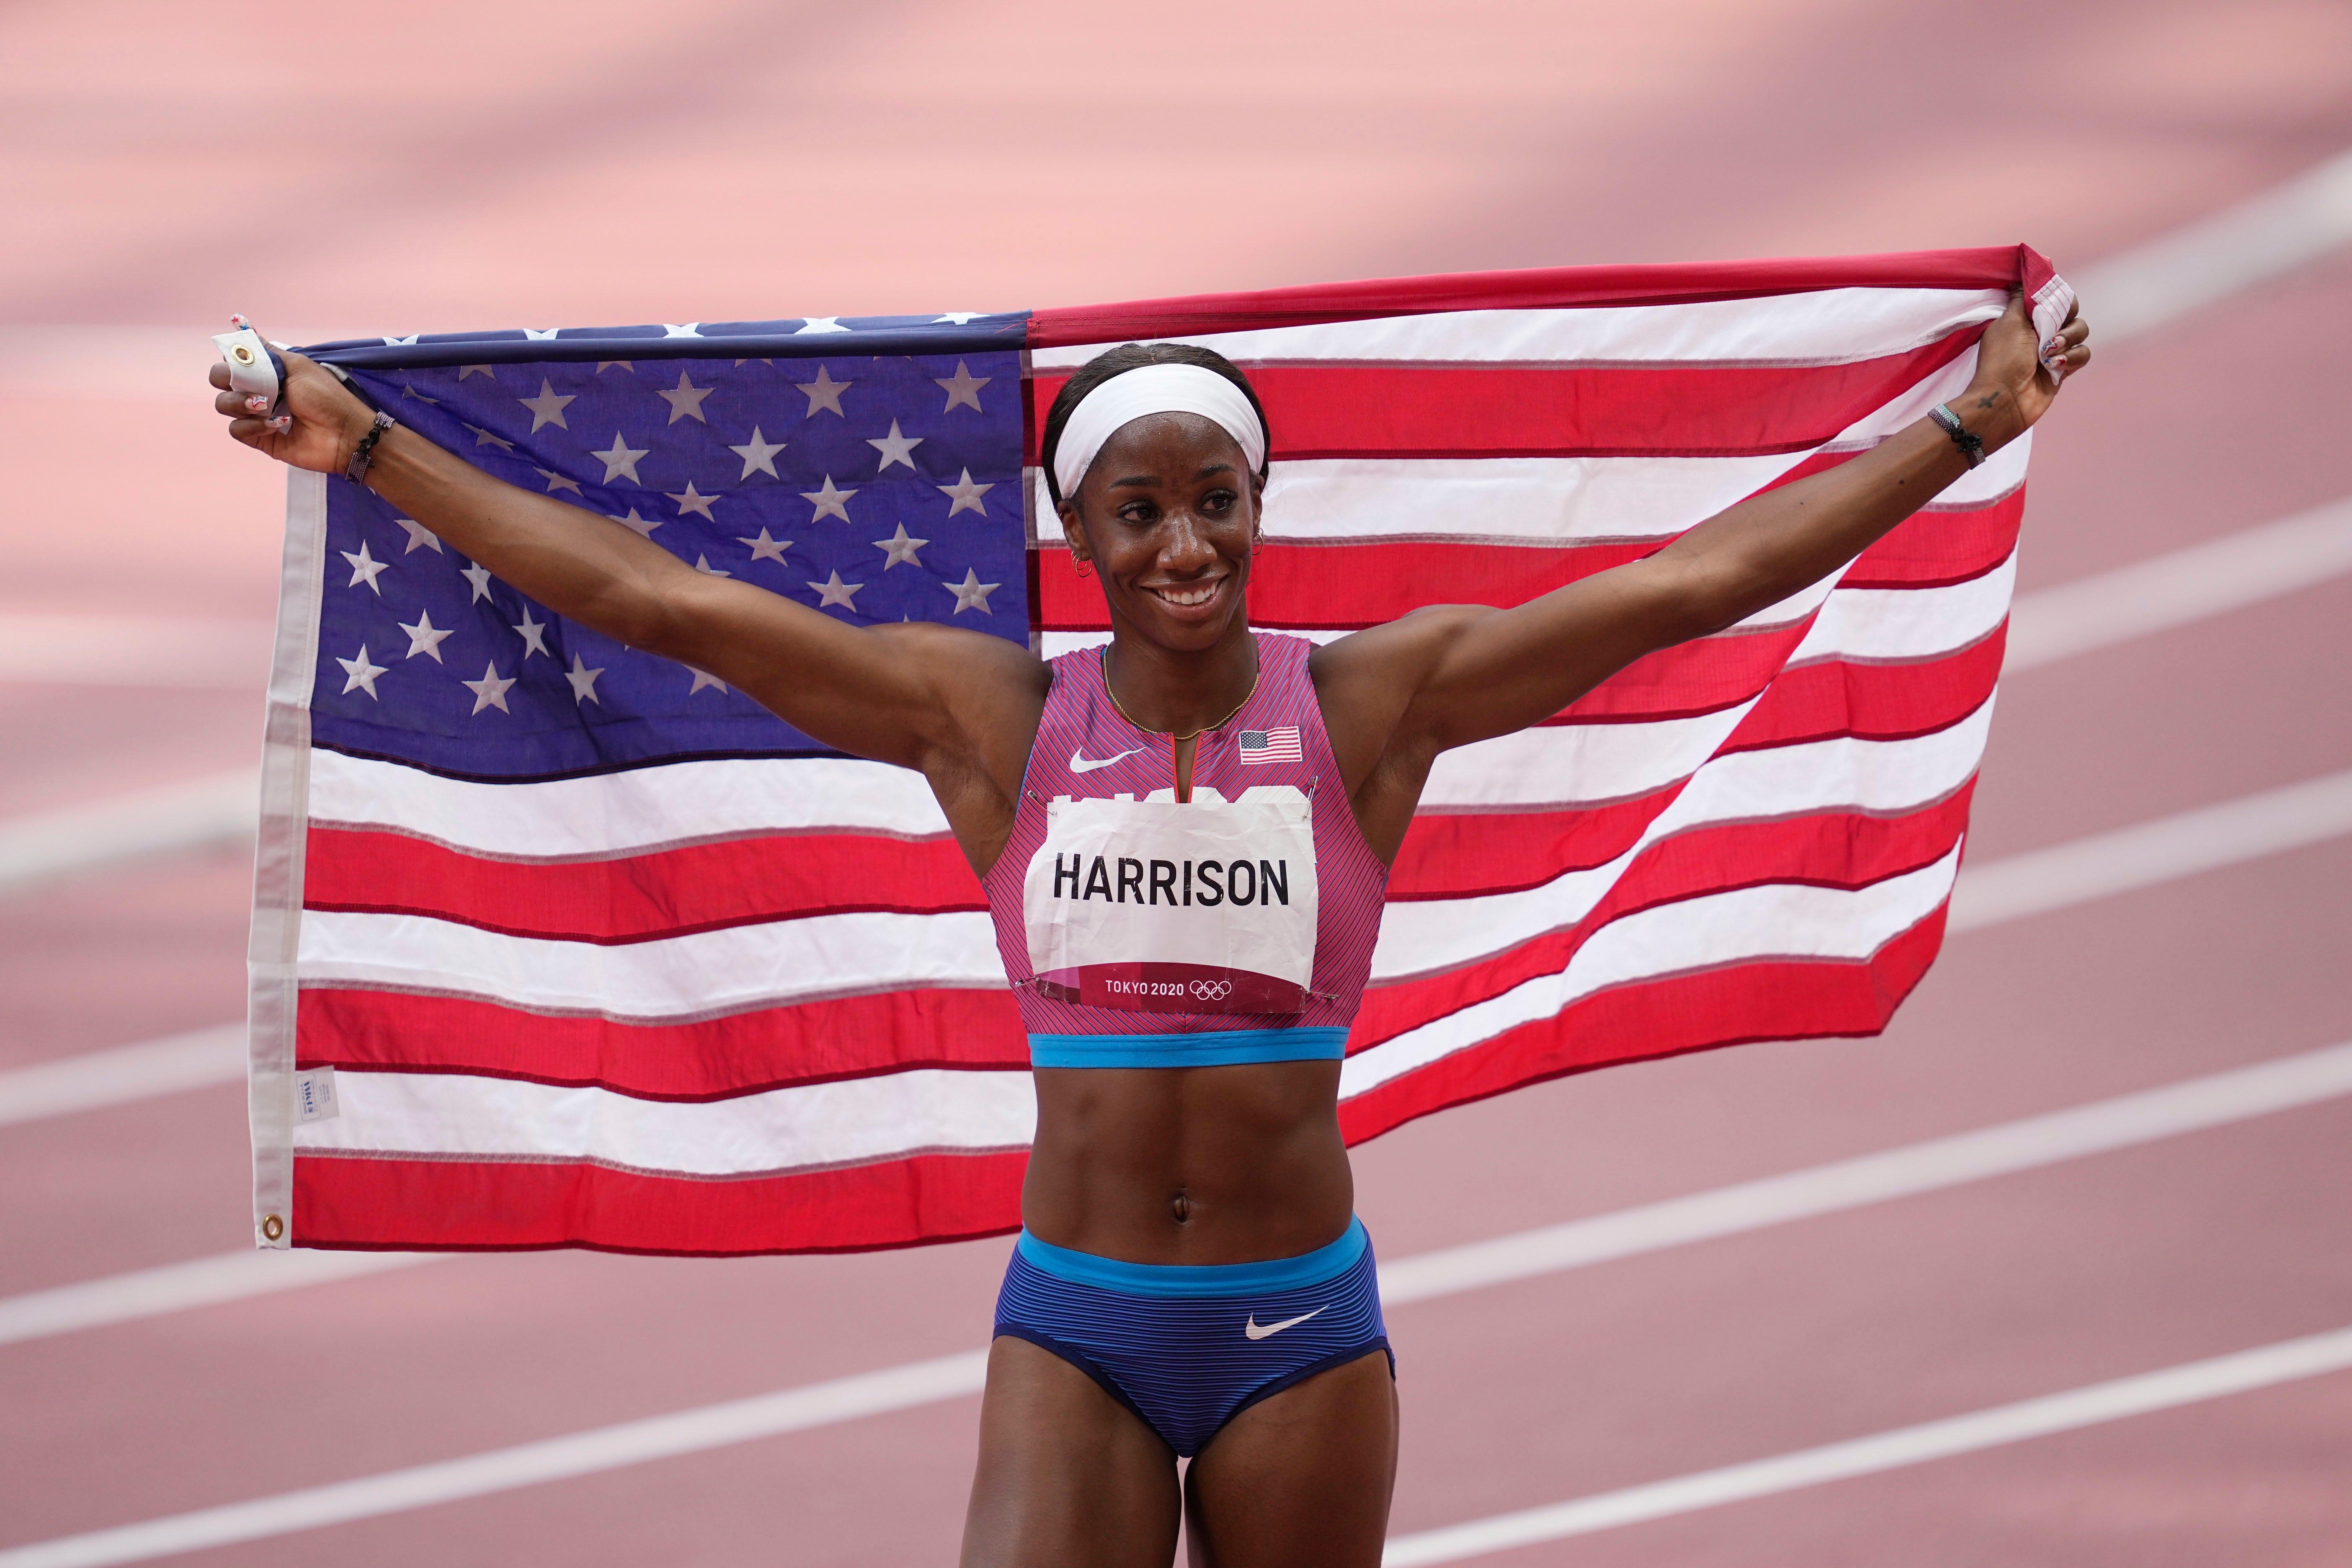 American Keni Harrison wins silver medal in 100-meter hurdles at Tokyo Games